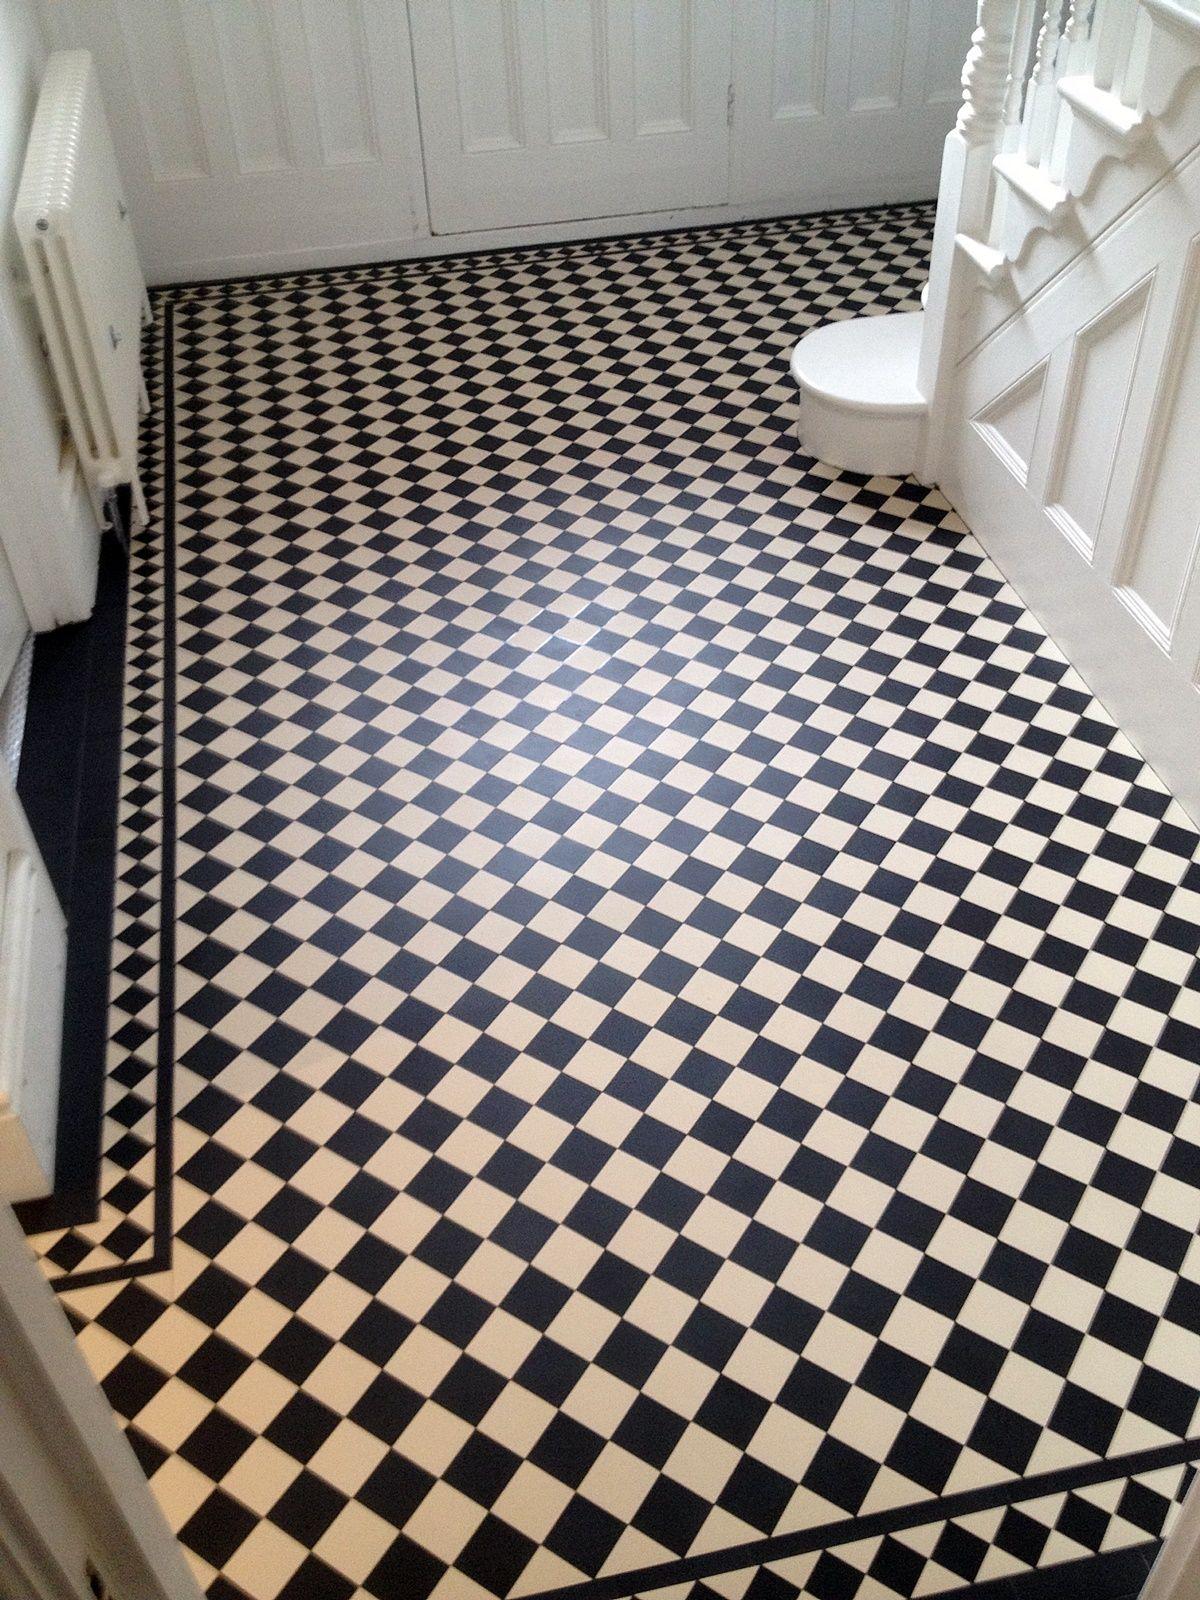 Victorian Black And White Hallway Tile Mosaic Floor Balham Clapham